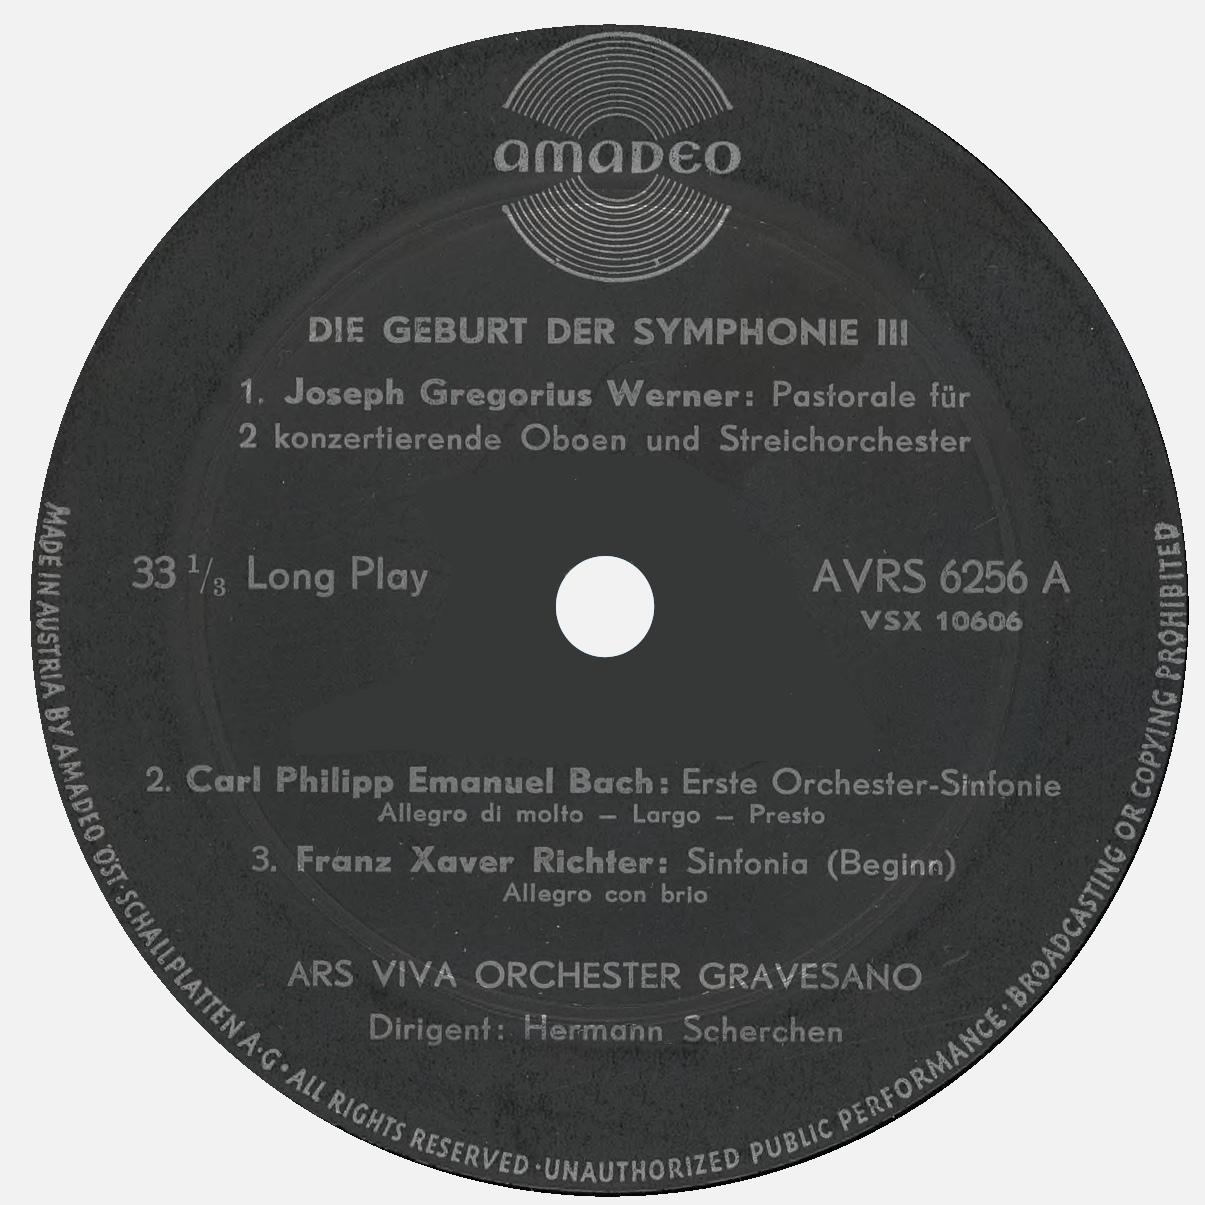 Étiquette recto du disque Amadeo AVRS 6256, 3e volume de «Geburt der Symphonie»